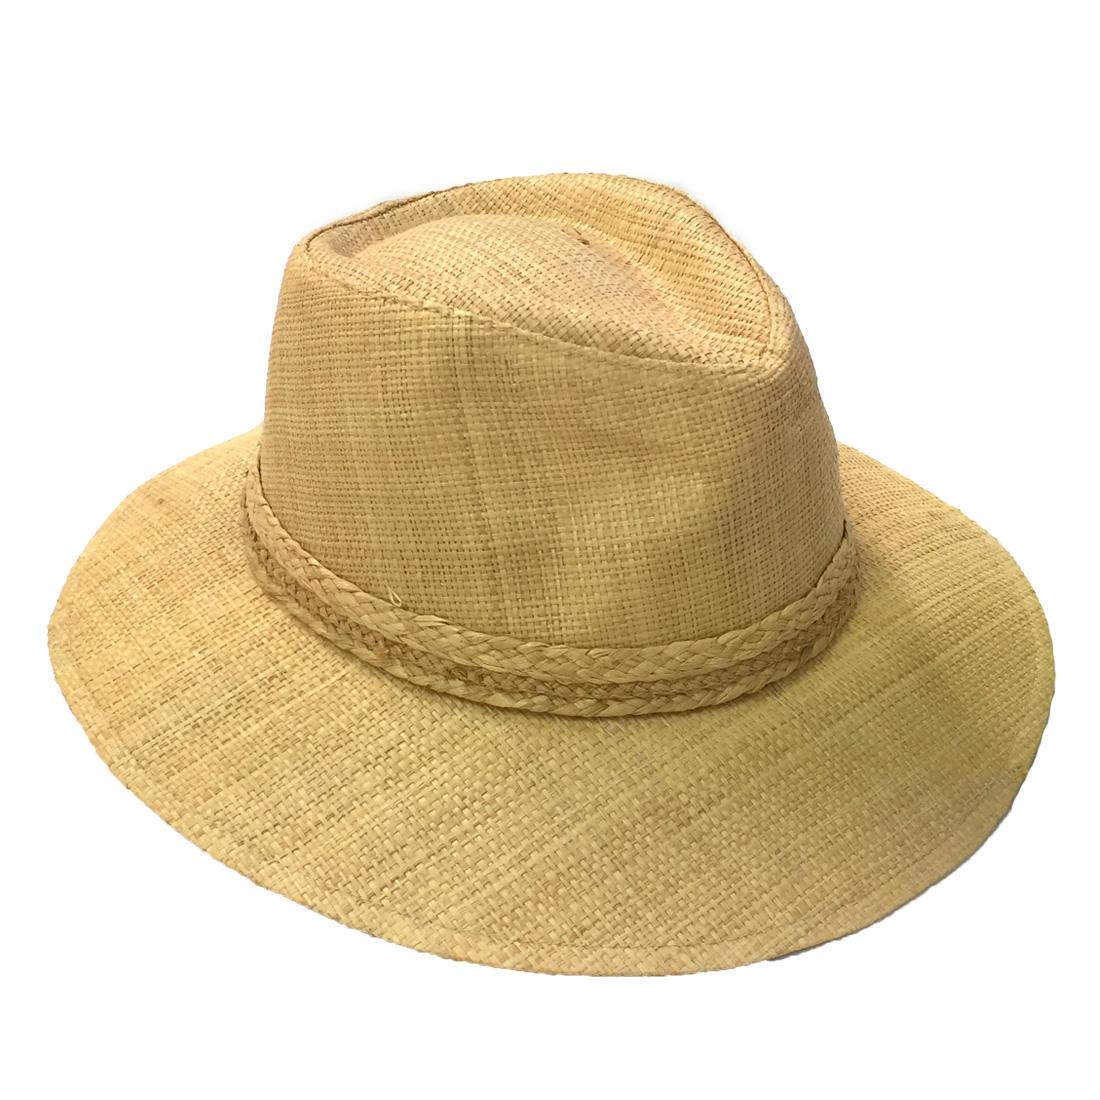 Sunglobe | Rakuten Global Market: Straw raffia hat farming gardening ...